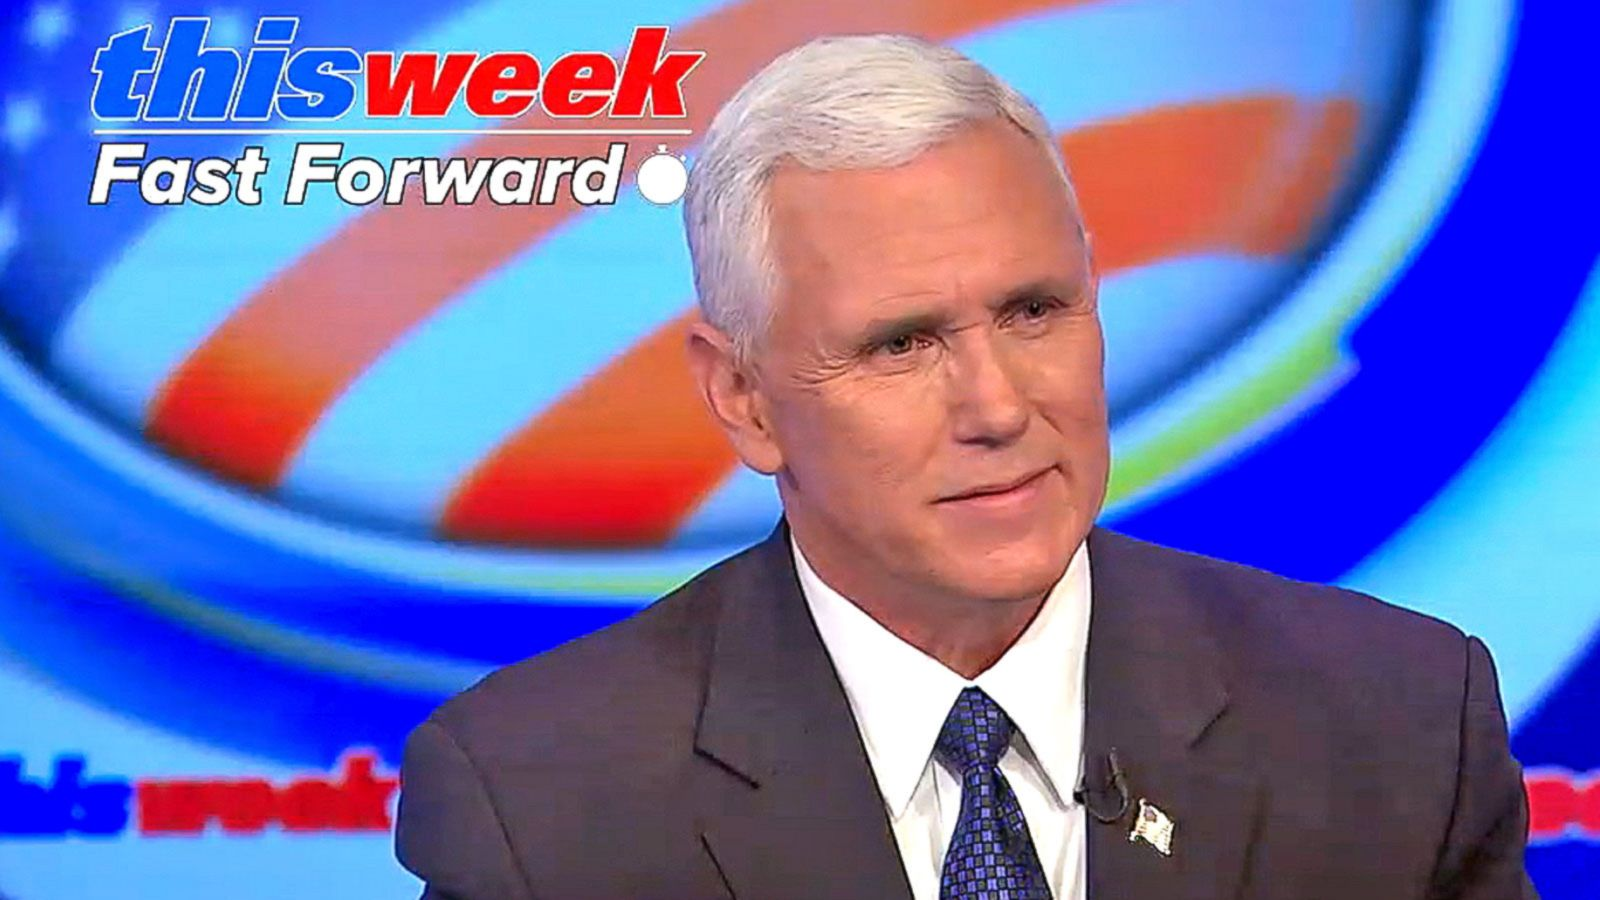 VIDEO: This Week Fast Forward 12.04.2016